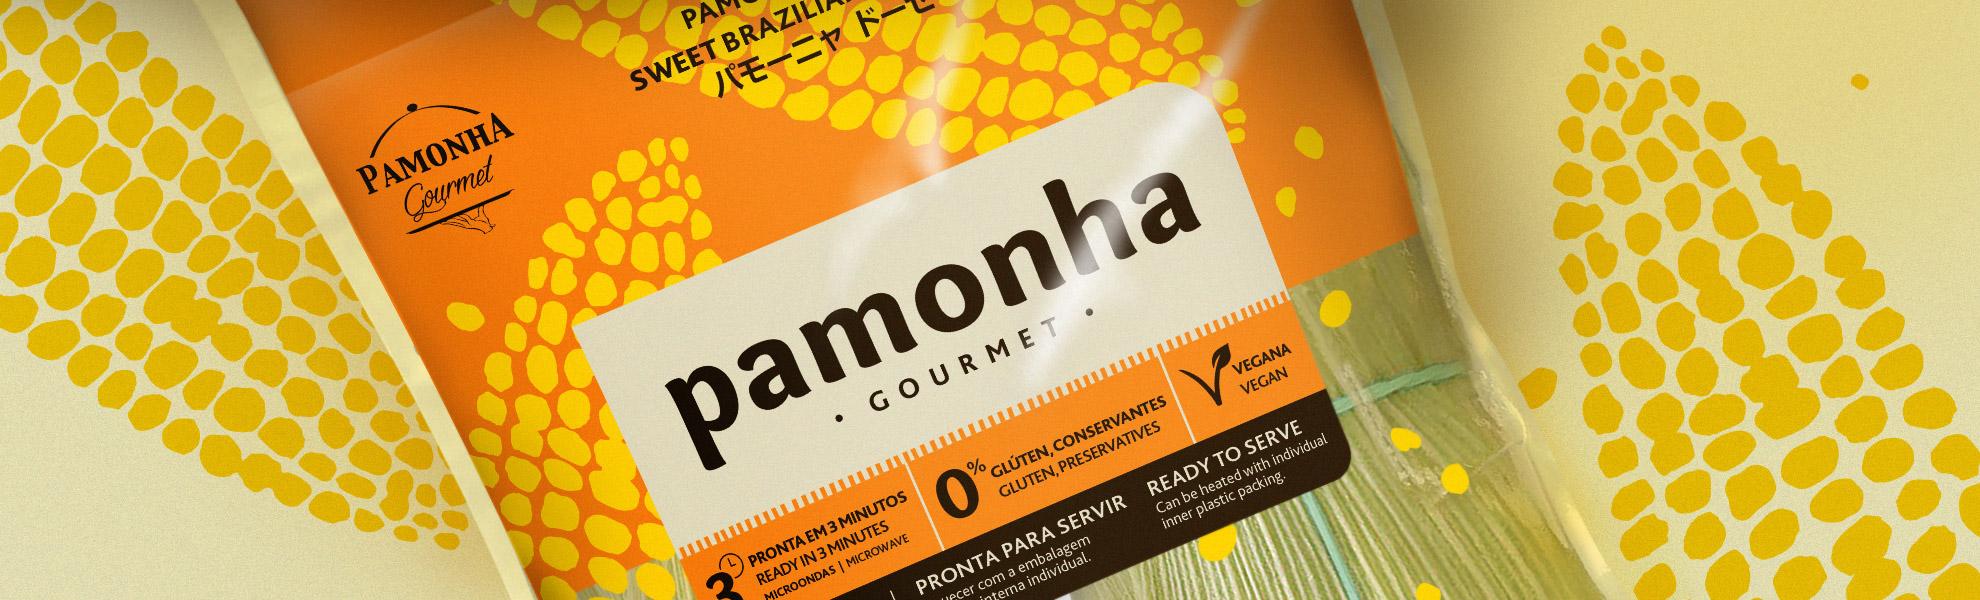 chelles-e-hayashi-design-portfolio-pamonha-gourmet-grafico-embalagem